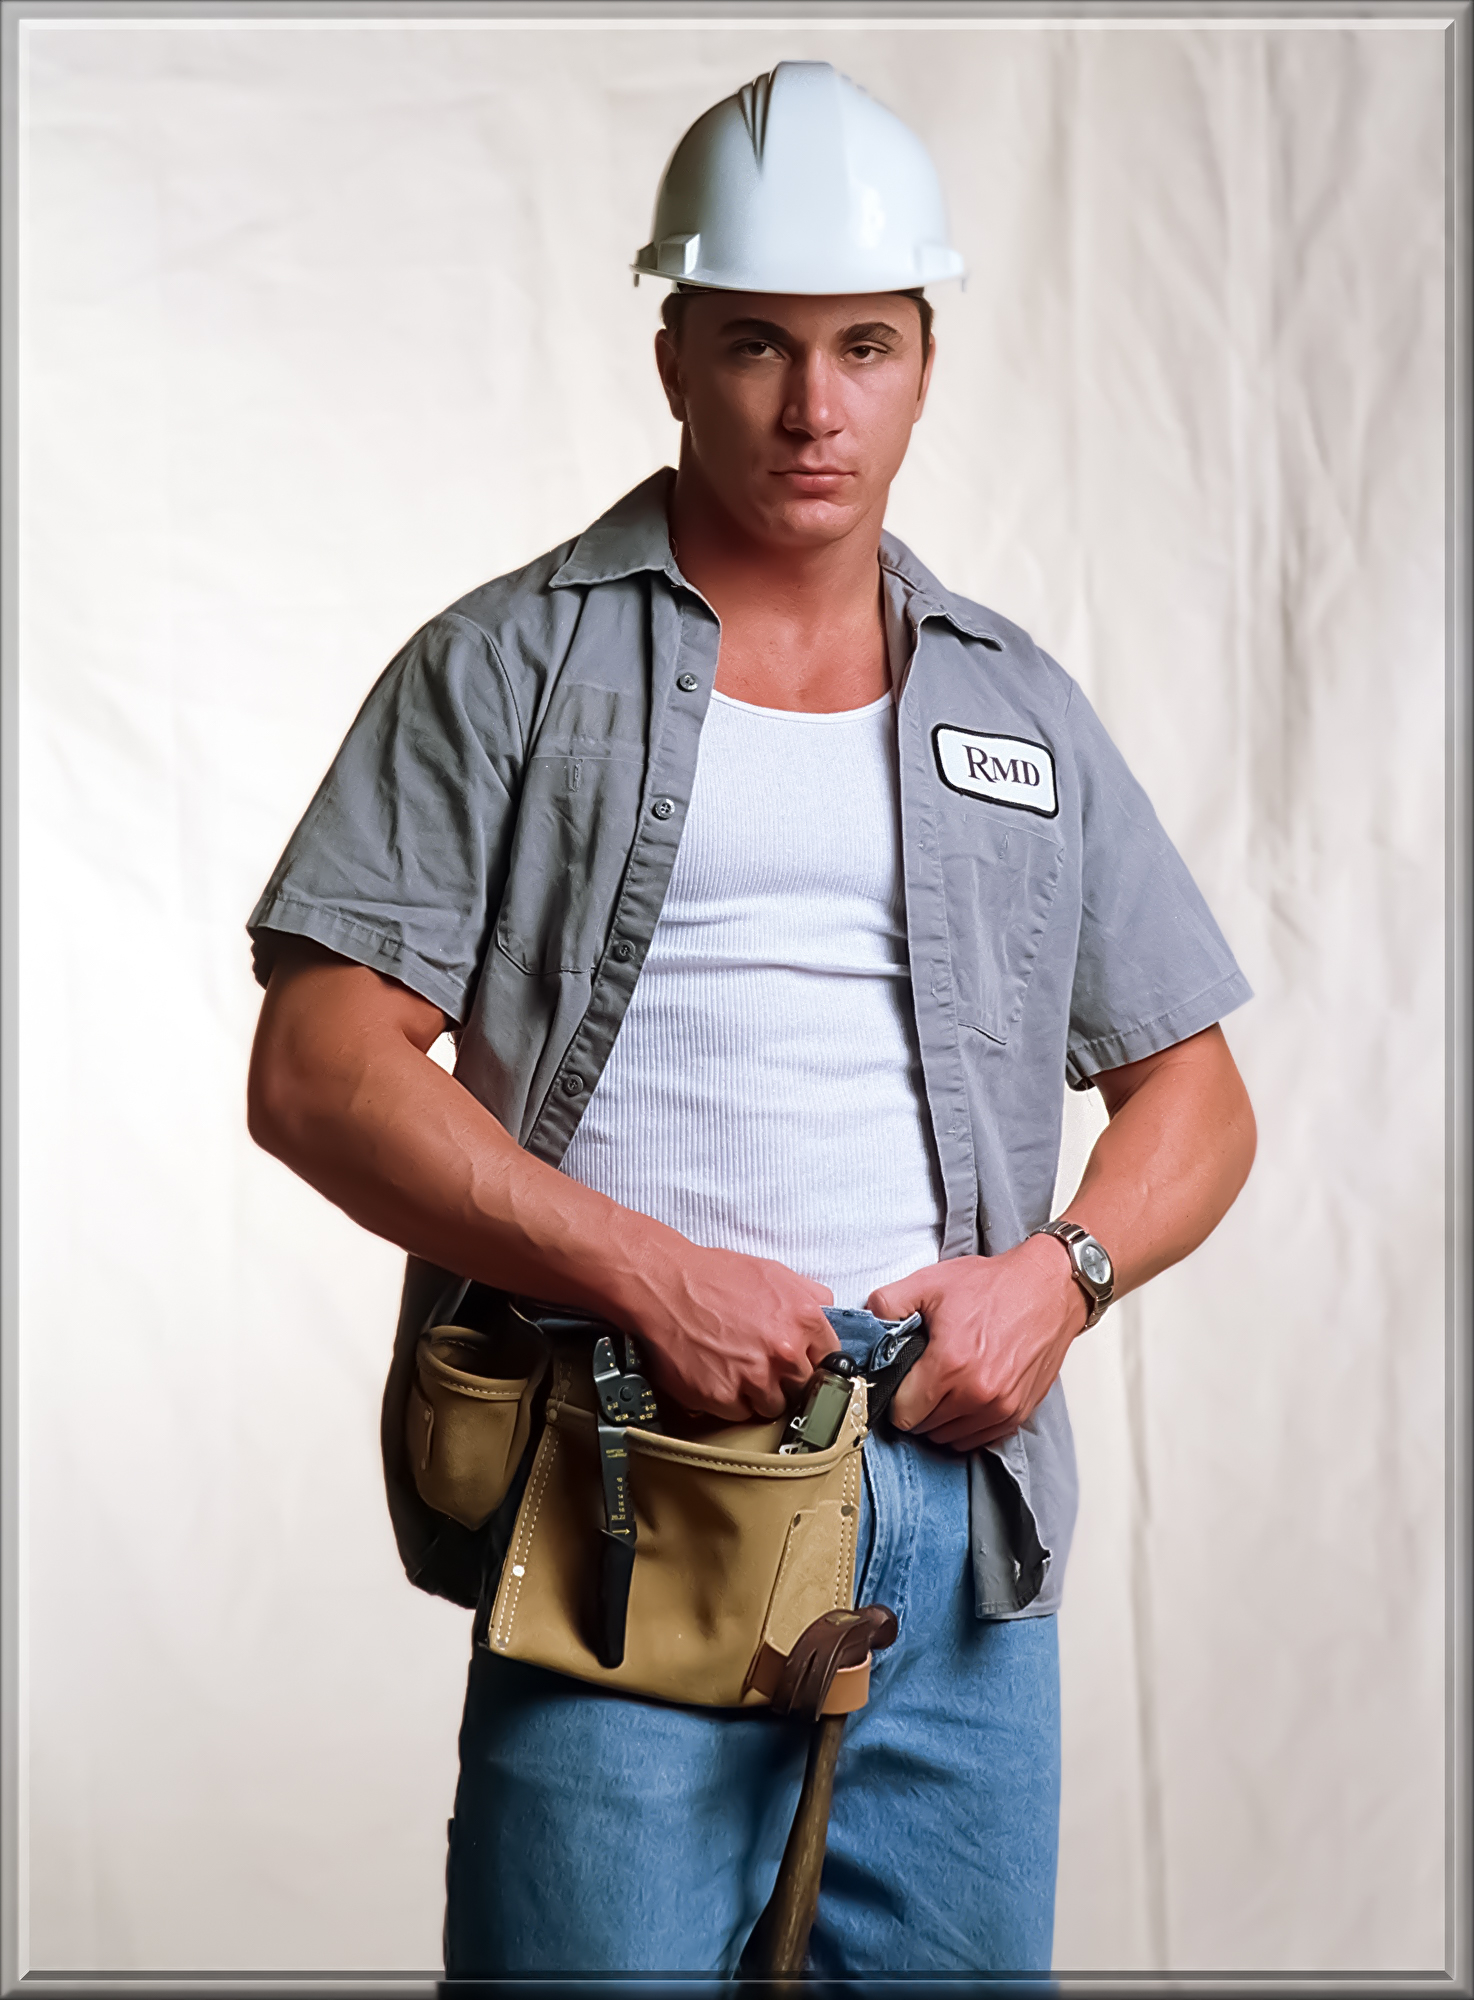 construction-worker-4020775.jpg